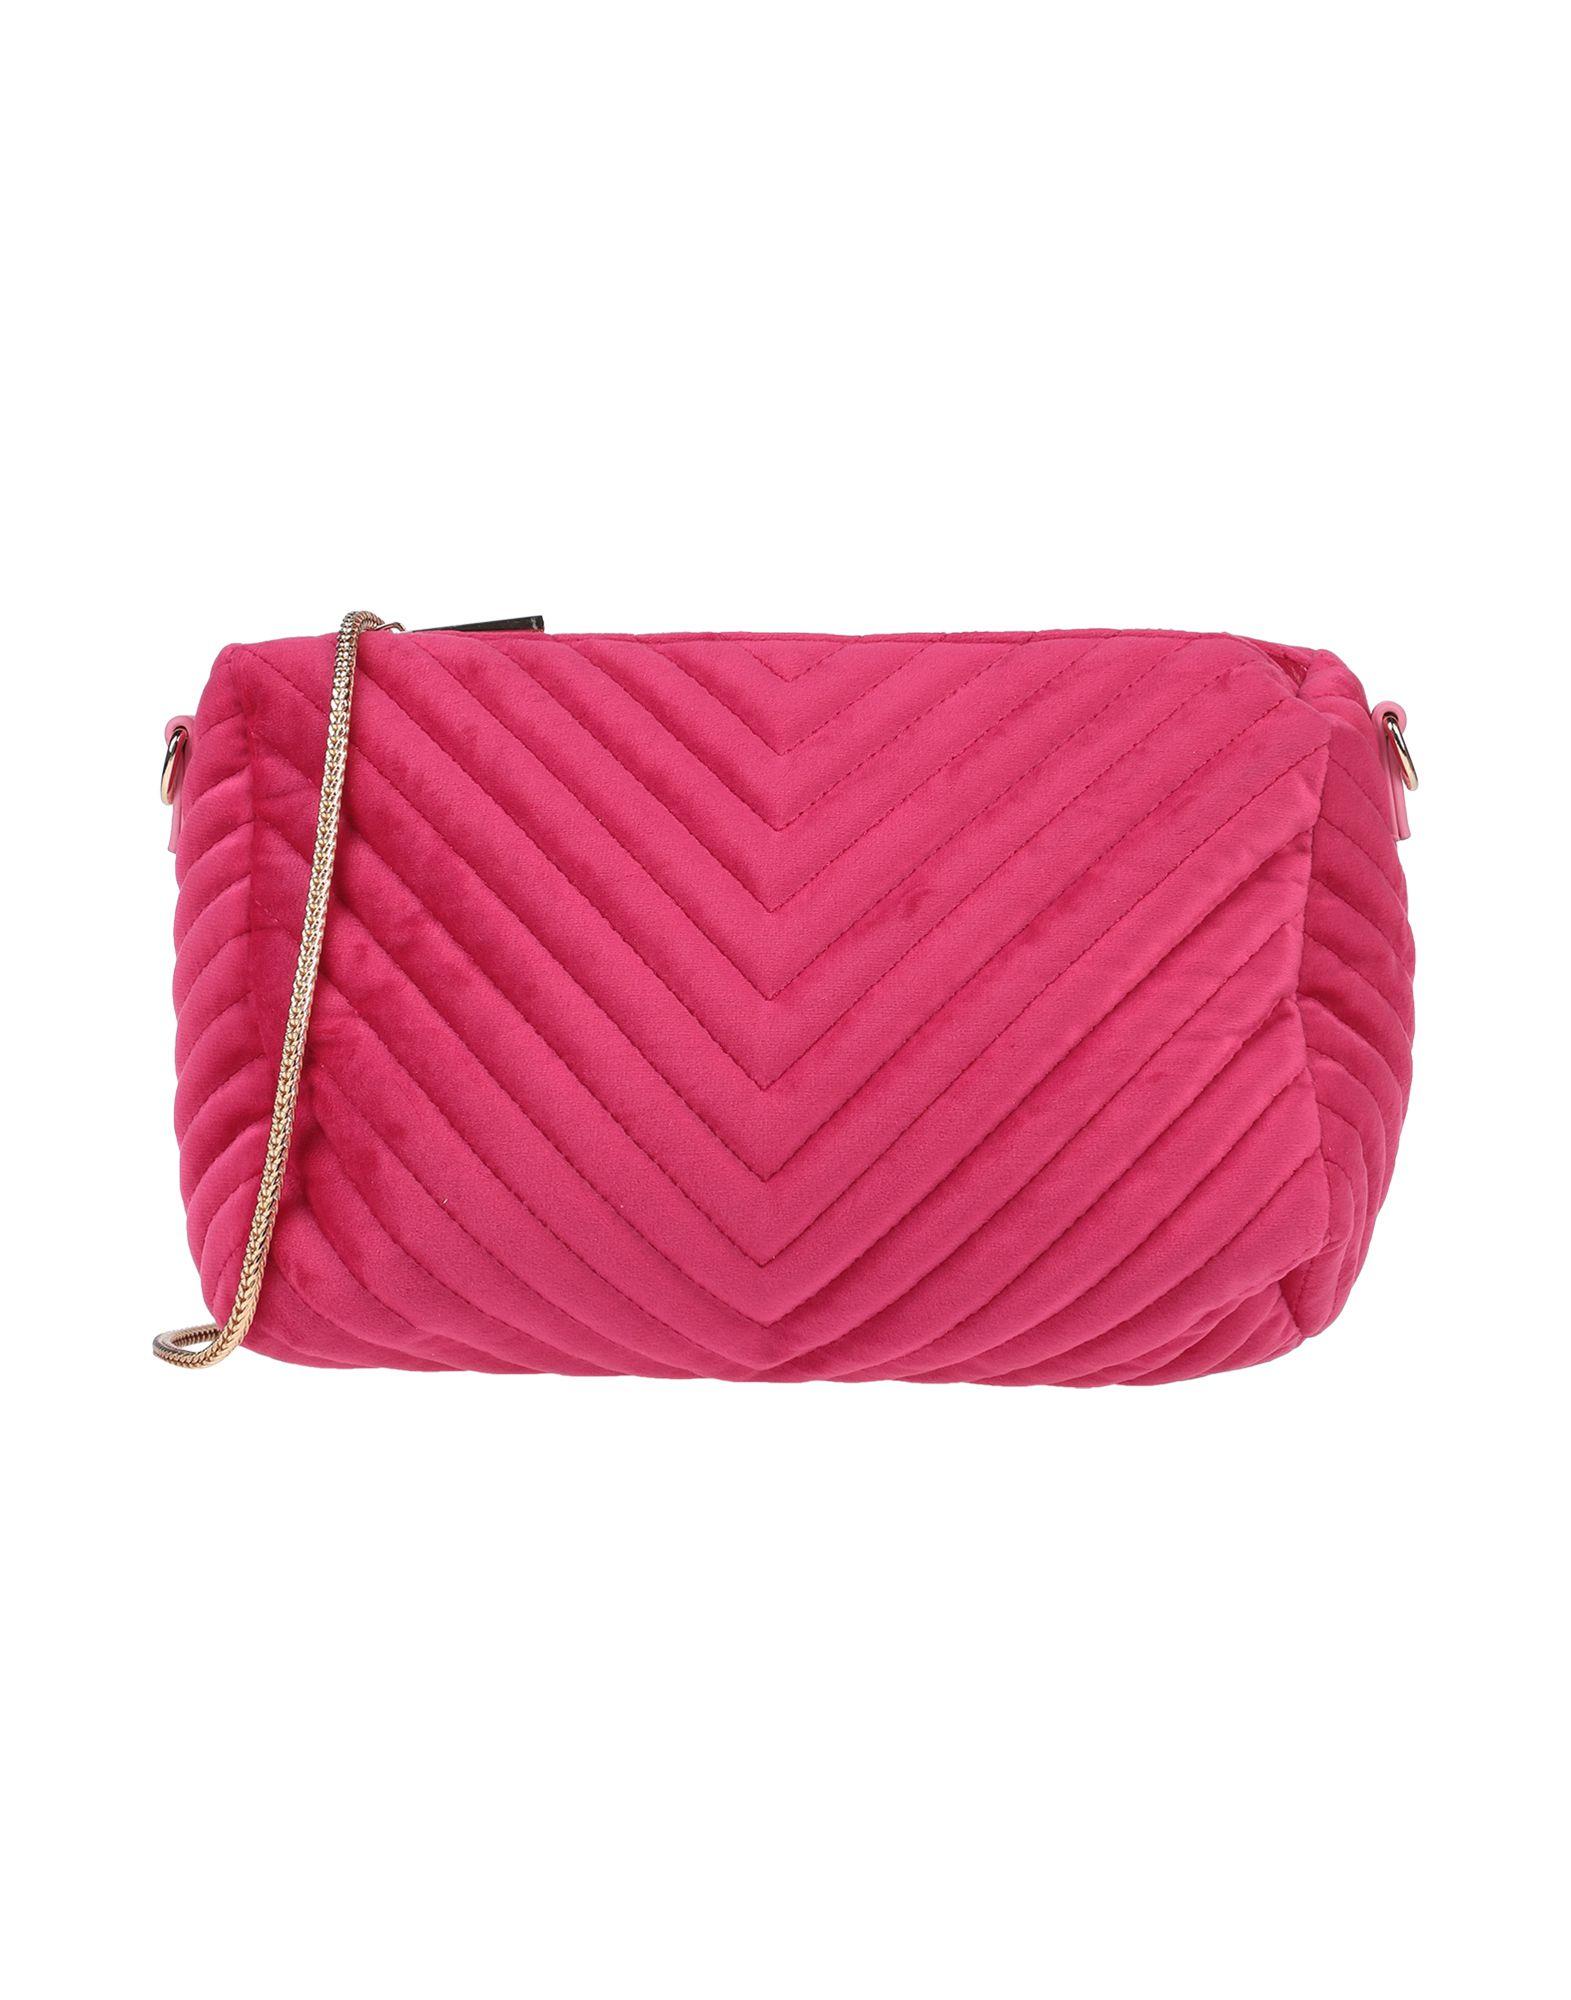 MIA BAG Сумка через плечо сумка через плечо new brand shippment price s9e canvas big bag